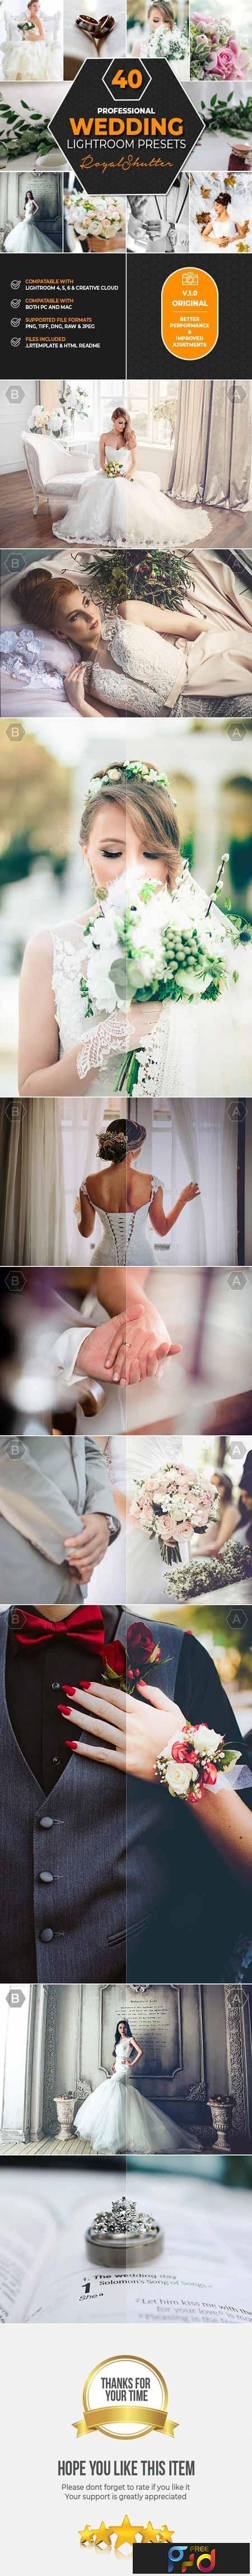 40 Pro Wedding Lightroom Presets 23150886 1